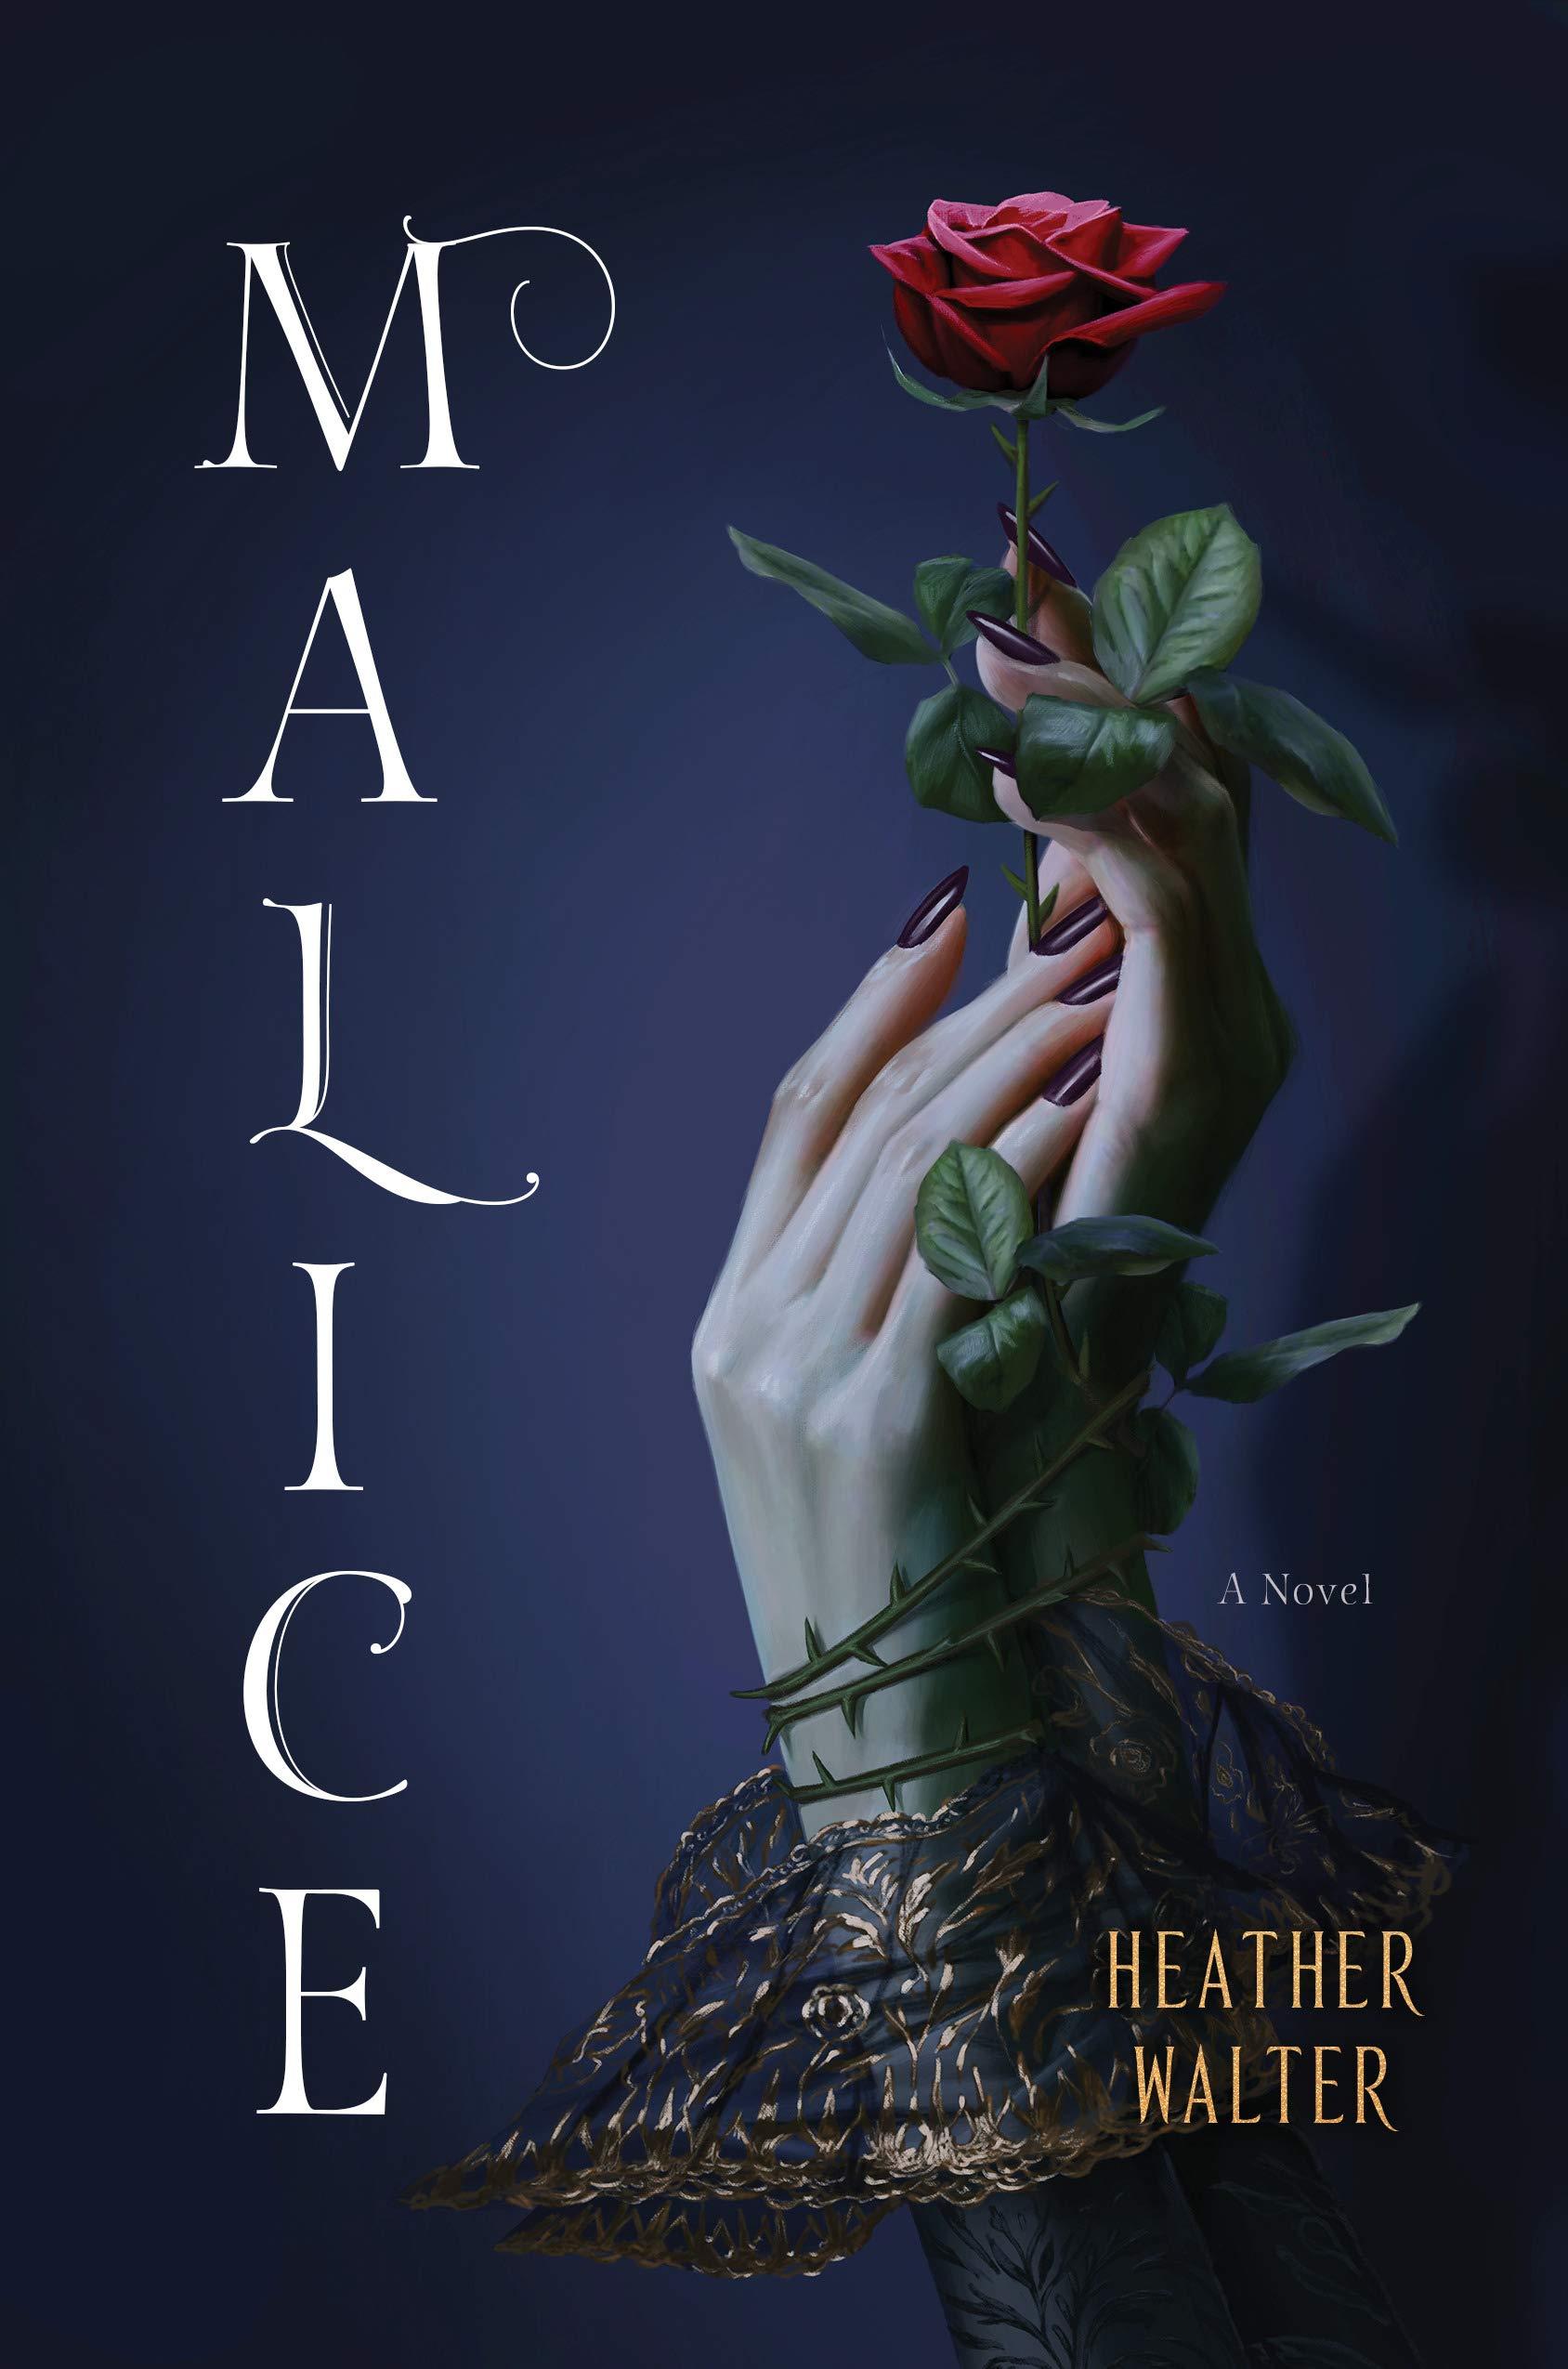 Amazon.com: Malice: A Novel: 9781984818652: Walter, Heather: Books